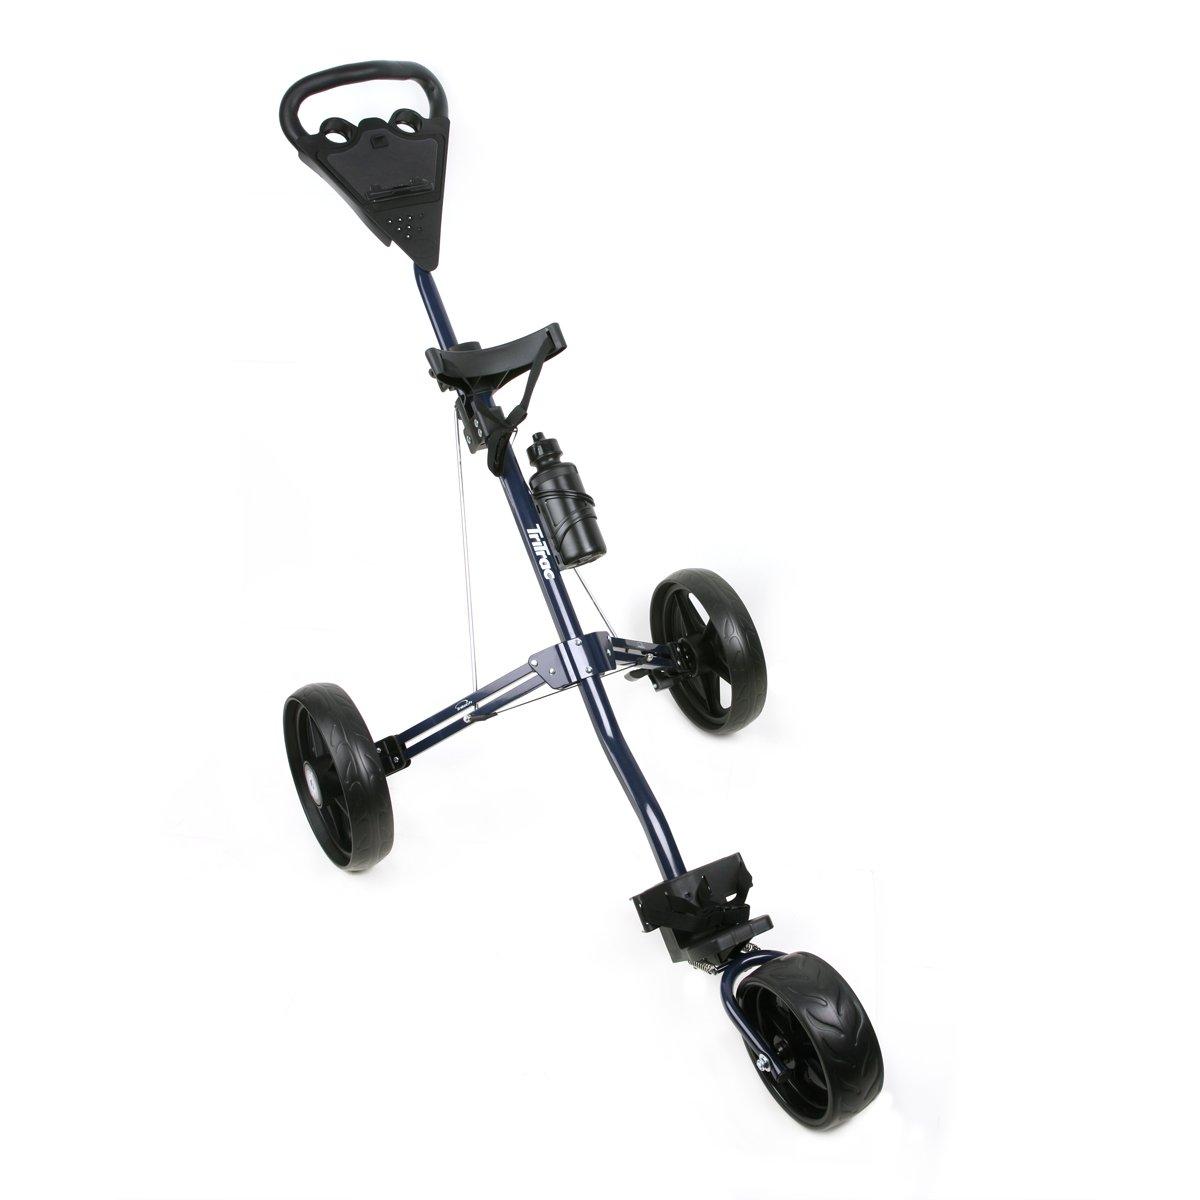 【メーカー直送】 Intech Tri B000A0IKHA Trac 3-Wheel Intech Tri Pull Golf Cart B000A0IKHA, 旭川北珈館:7a87e87c --- a0267596.xsph.ru